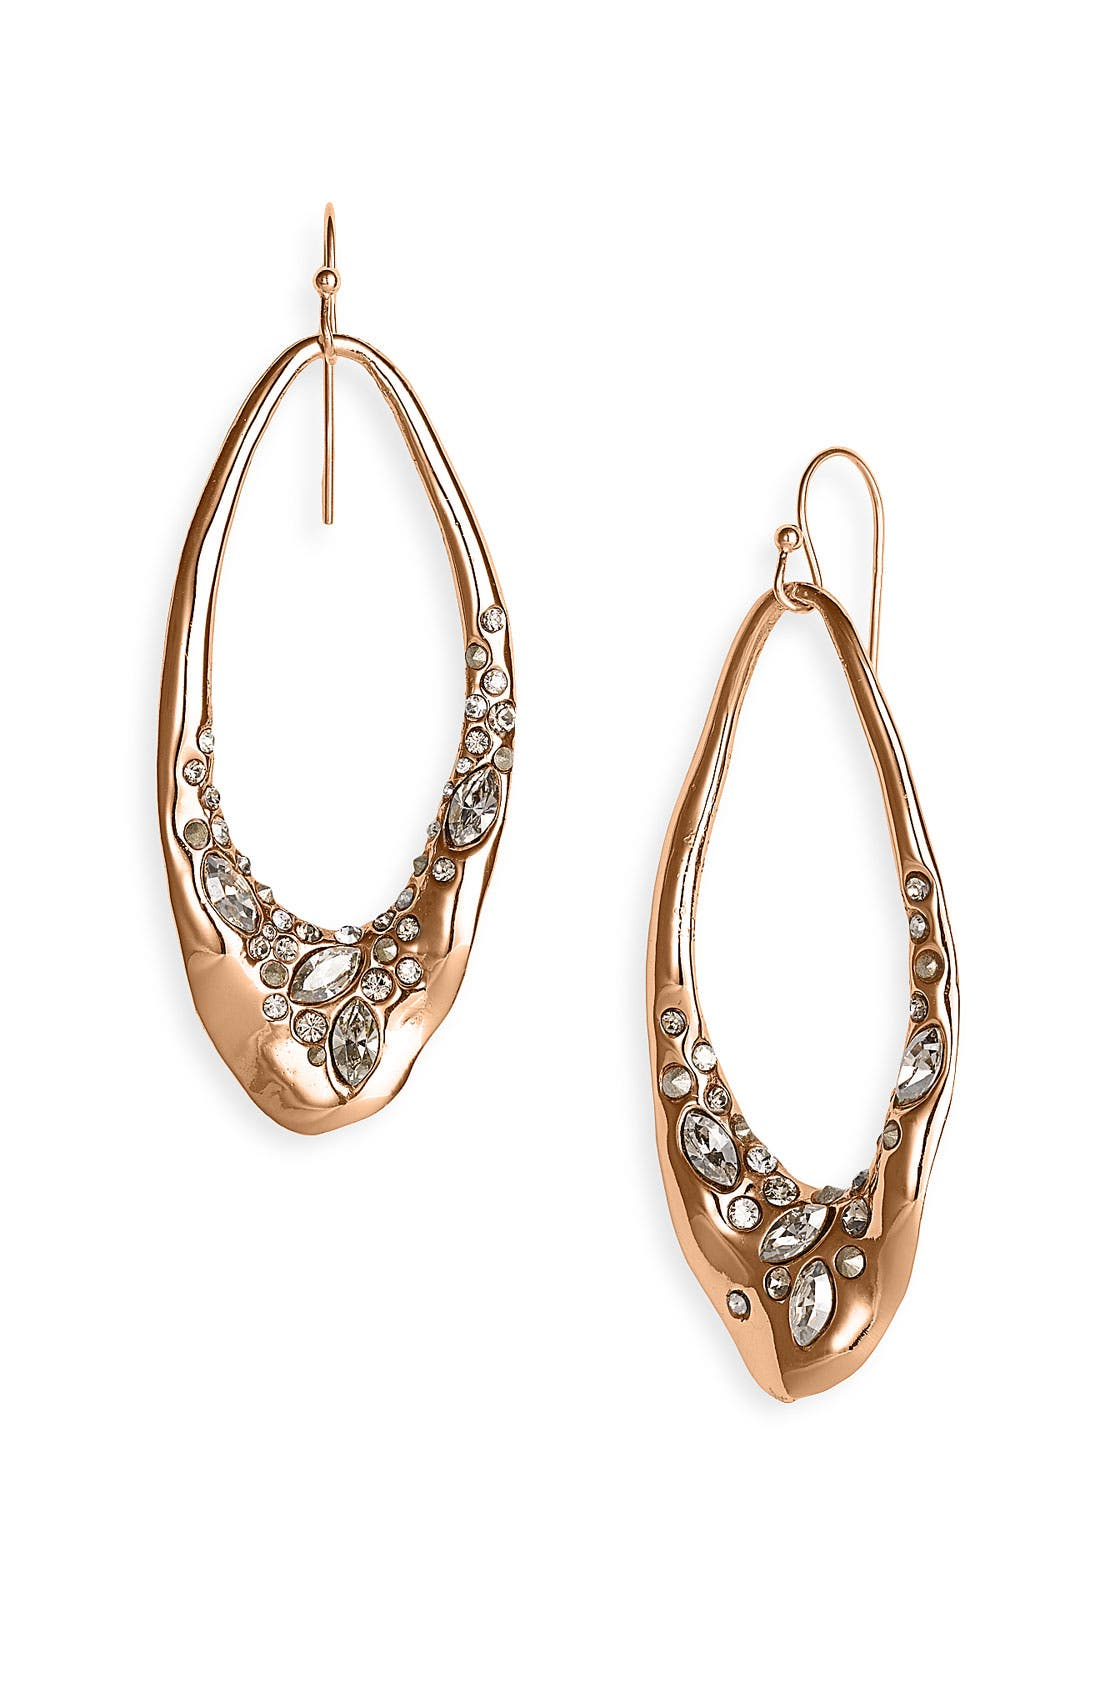 Main Image - Alexis Bittar 'Miss Havisham' Encrusted Liquid Link Earrings (Nordstrom Exclusive)